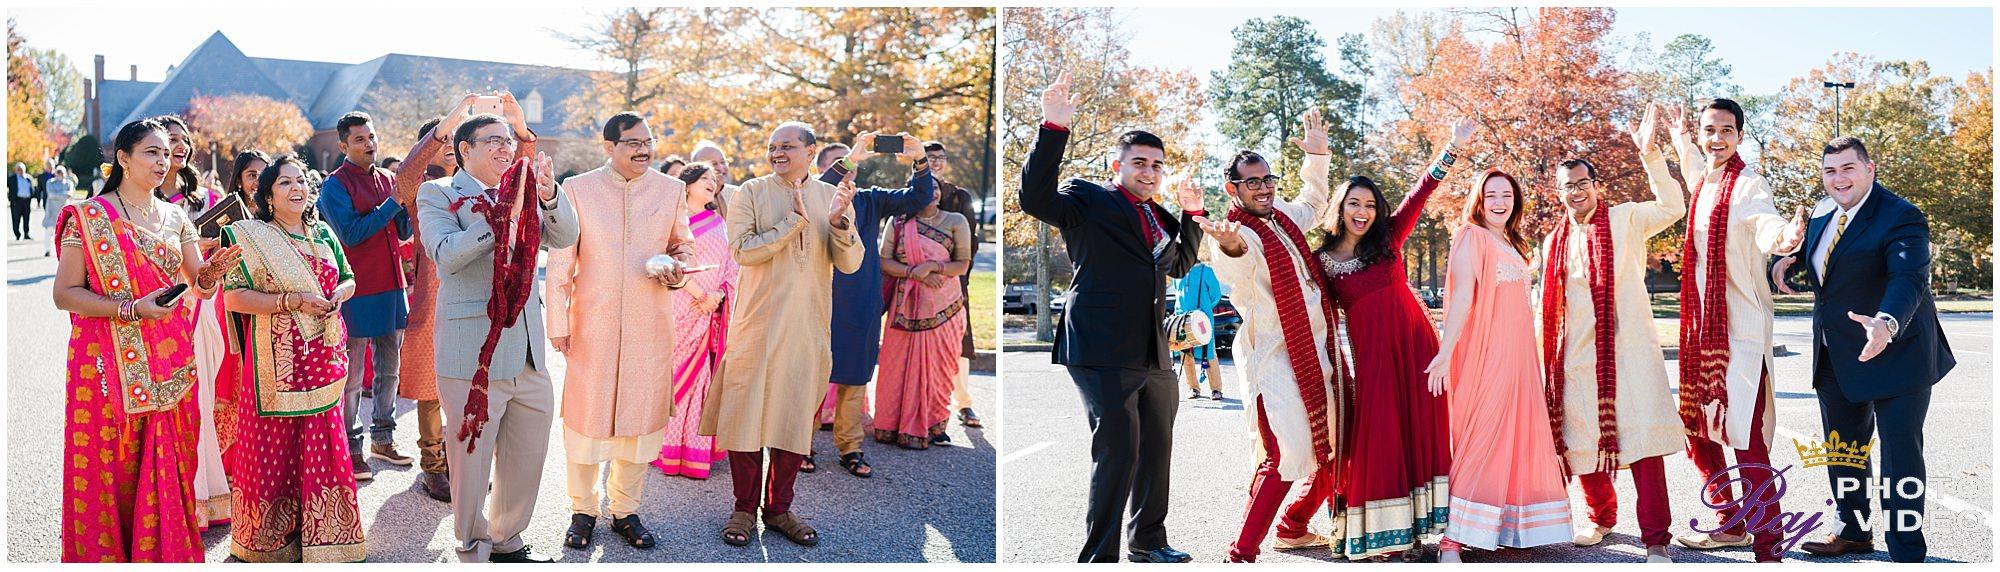 Founders-Inn-and-Spa-Virginia-Beach-VA-Indian-Wedding-Harini-Vivek-43.jpg